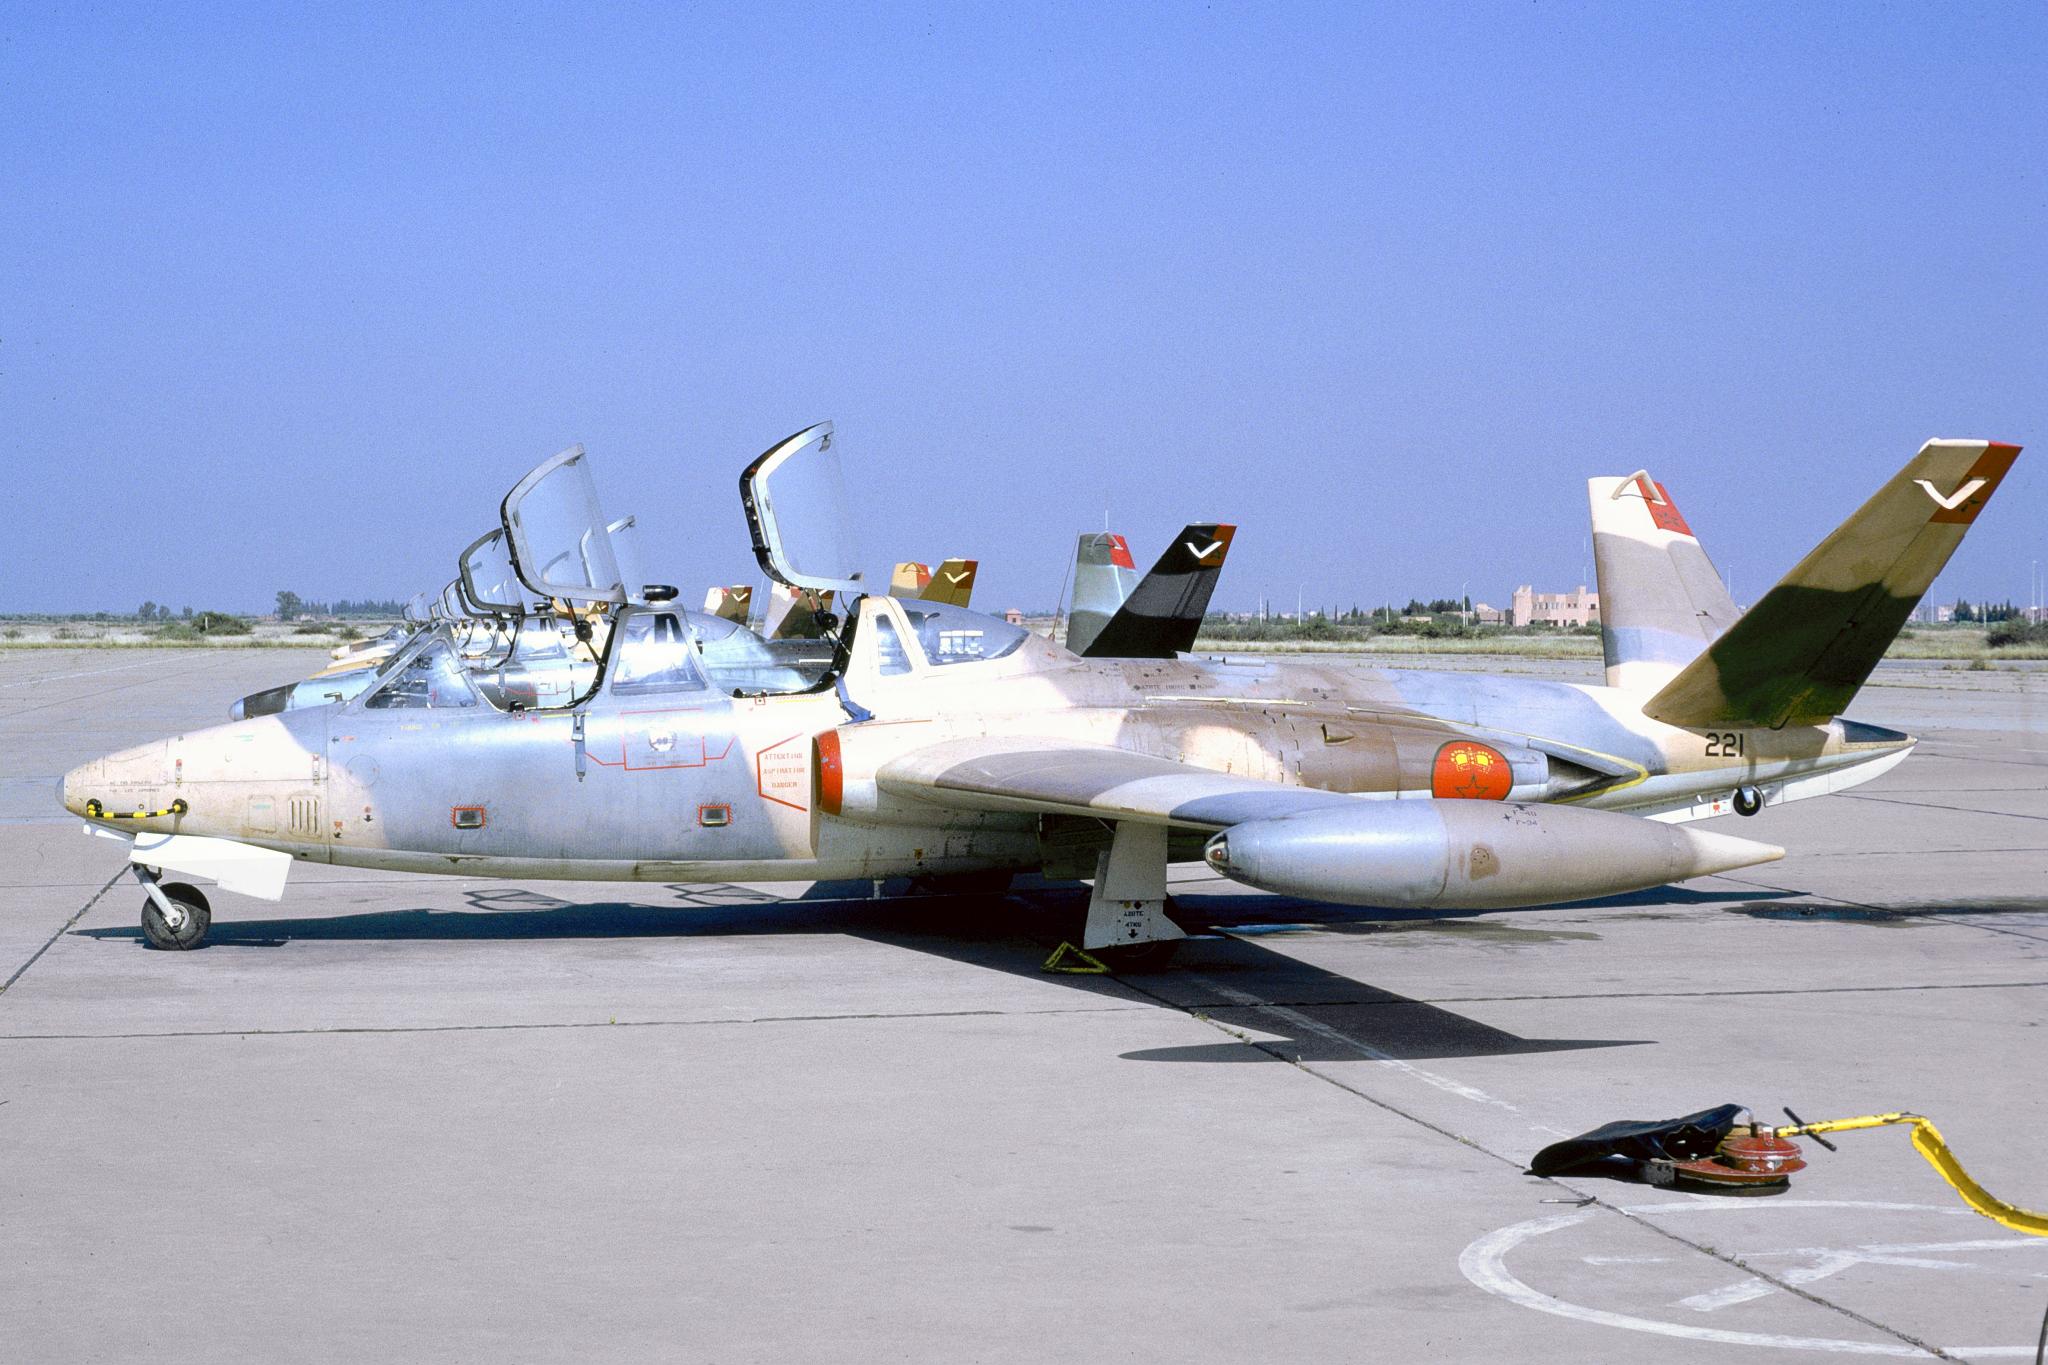 FRA: Photos anciens avions des FRA - Page 13 32094586747_4ceae92c33_o